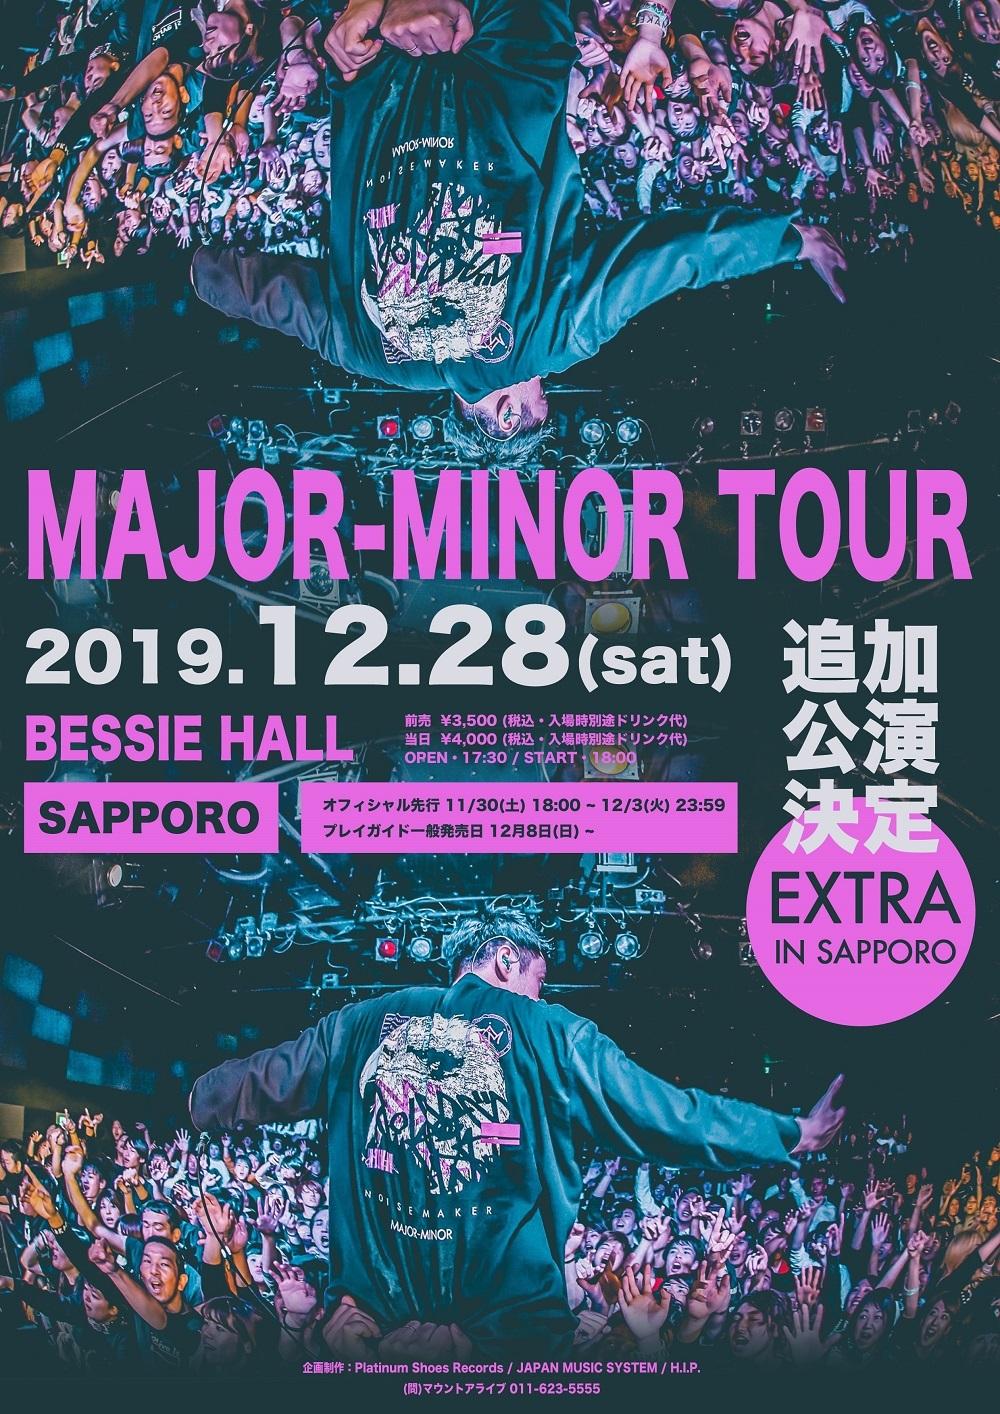 """MAJOR-MINOR TOUR EXTRA"" IN SAPPORO"